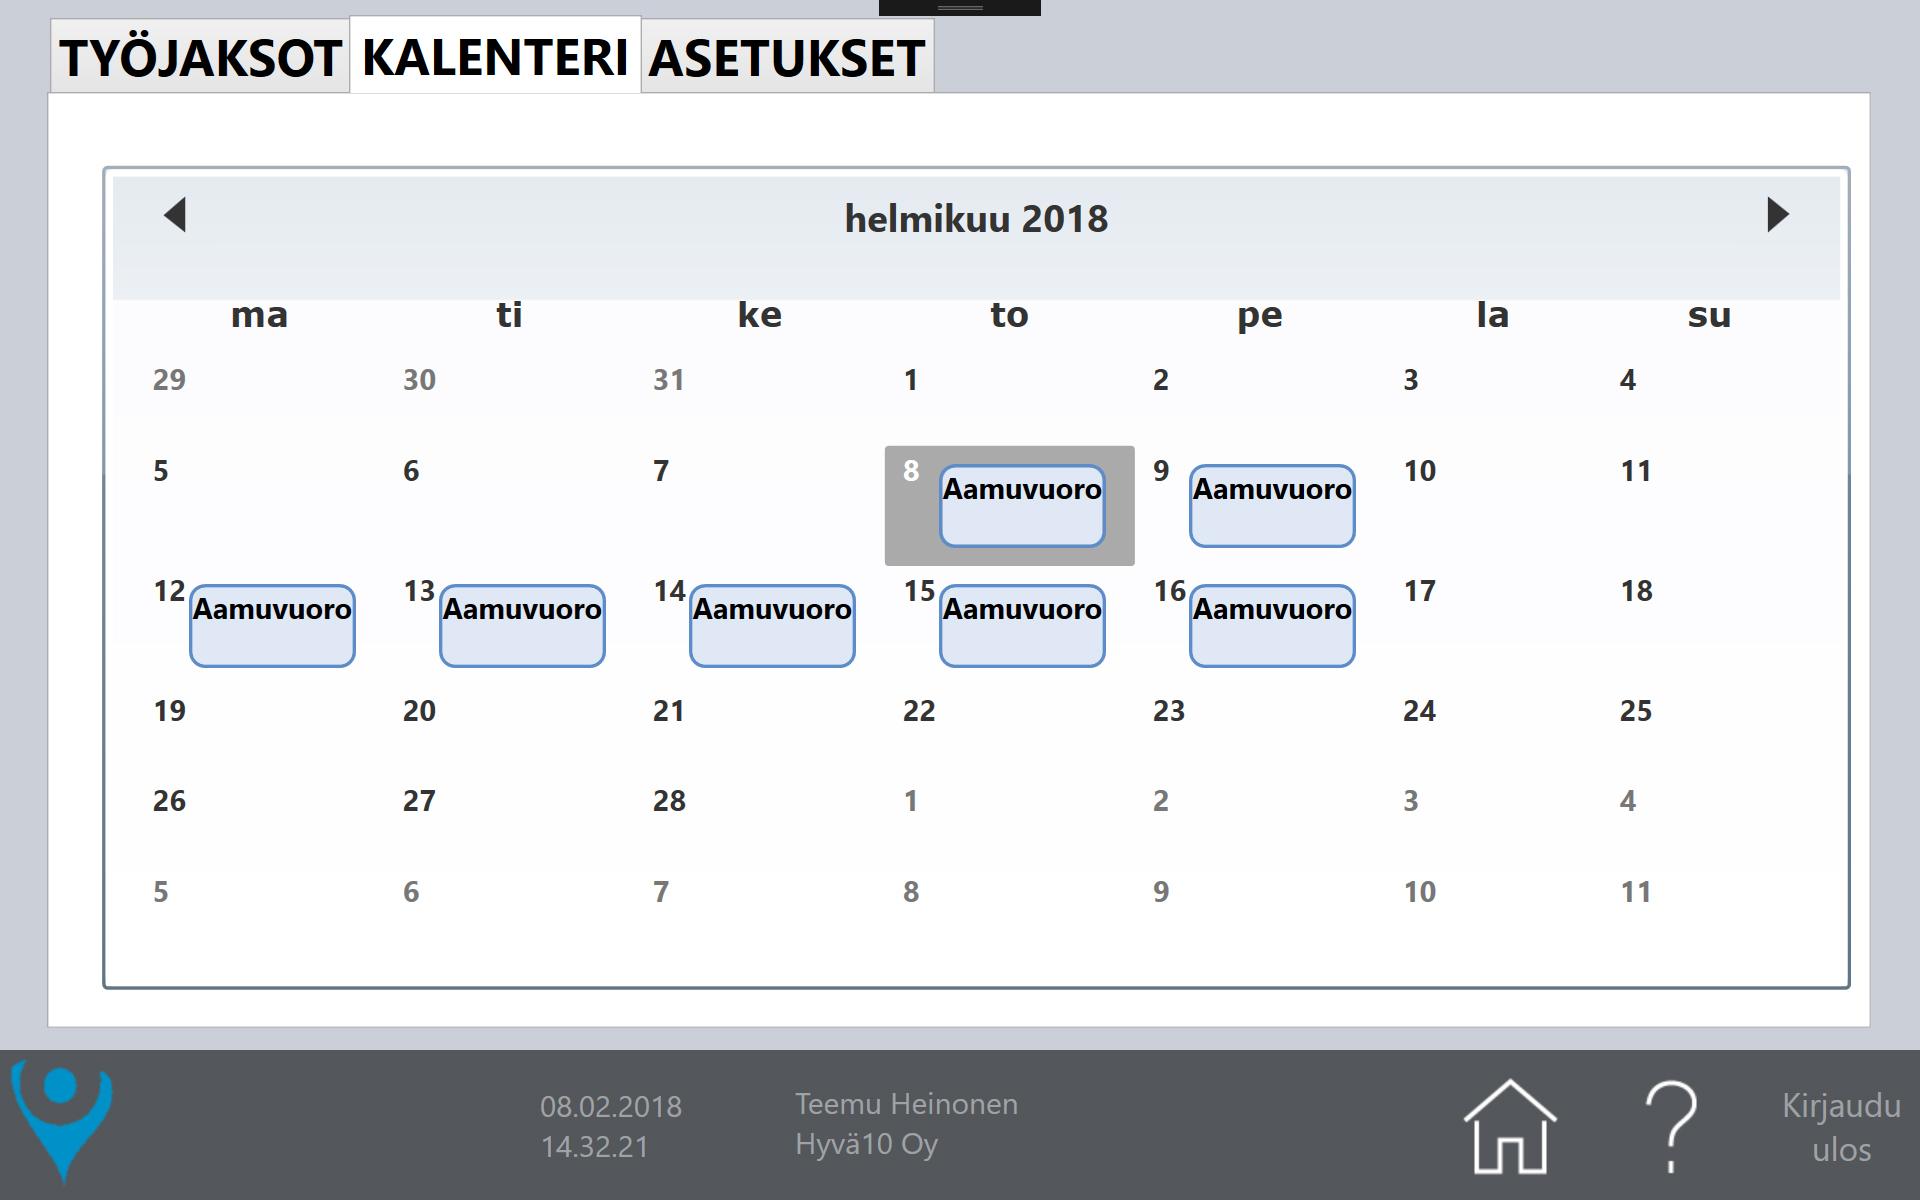 terminaali_kalenteri.jpg